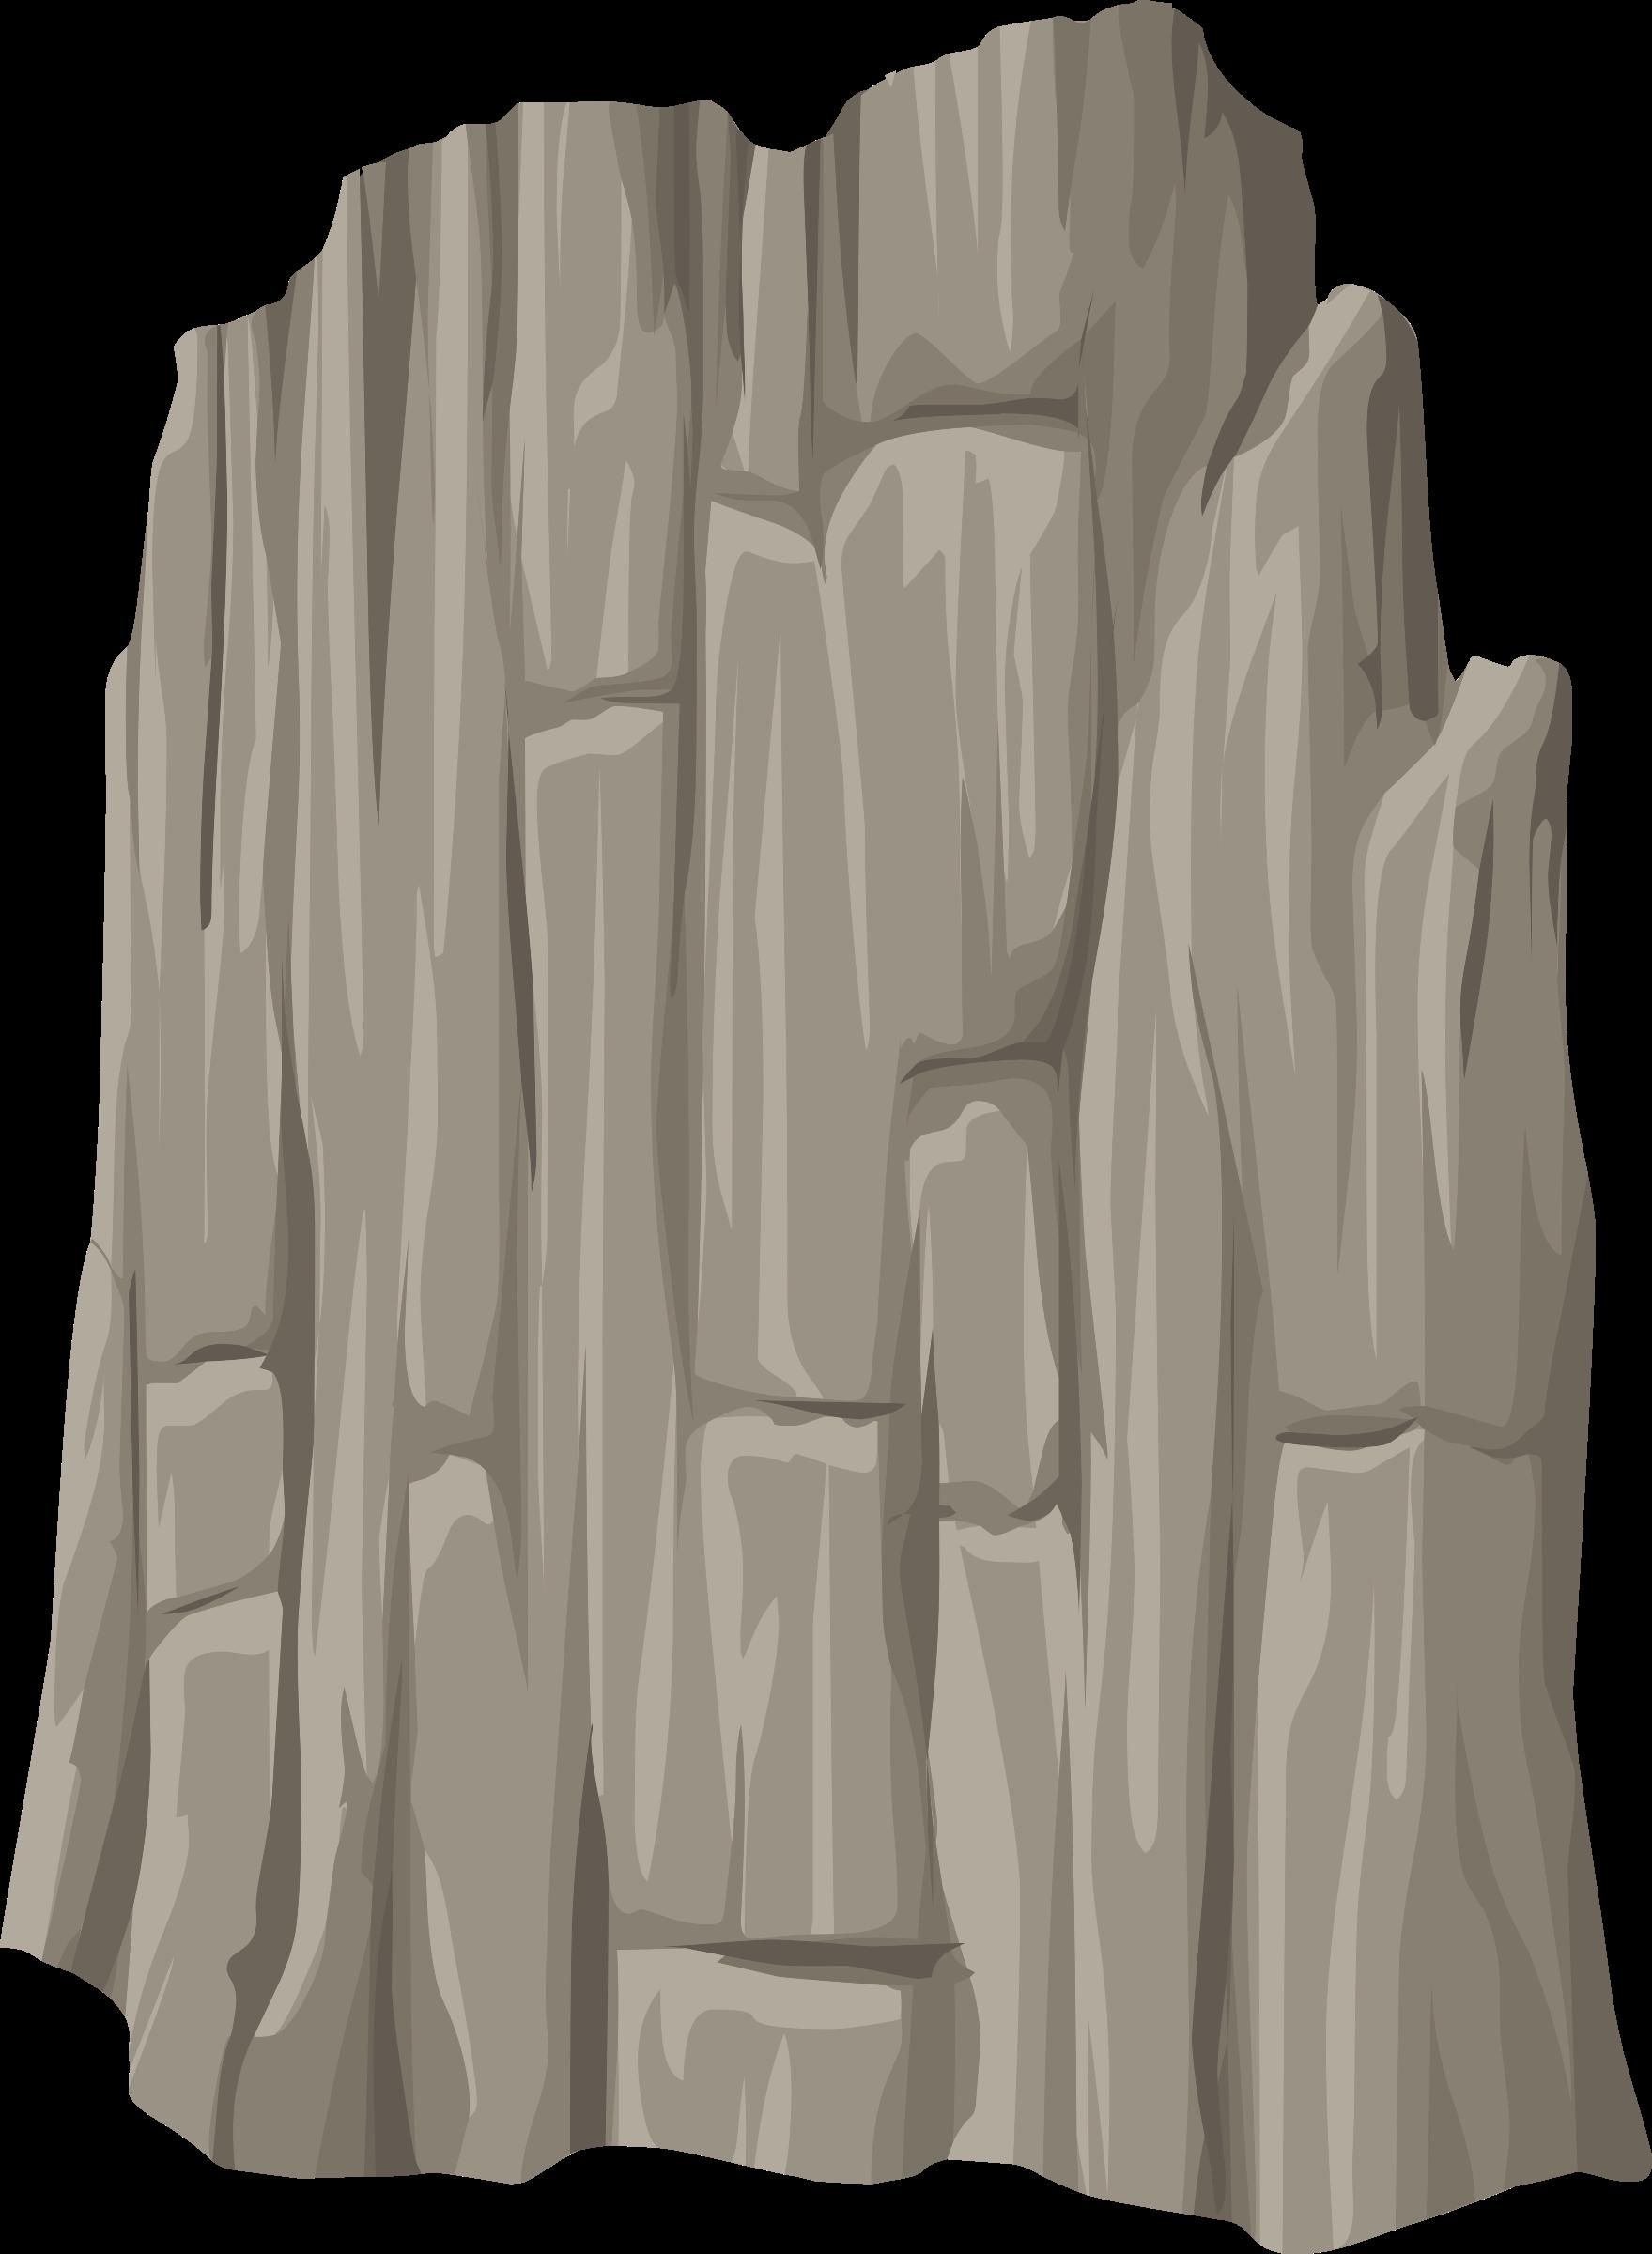 Rock clipart cliff #14